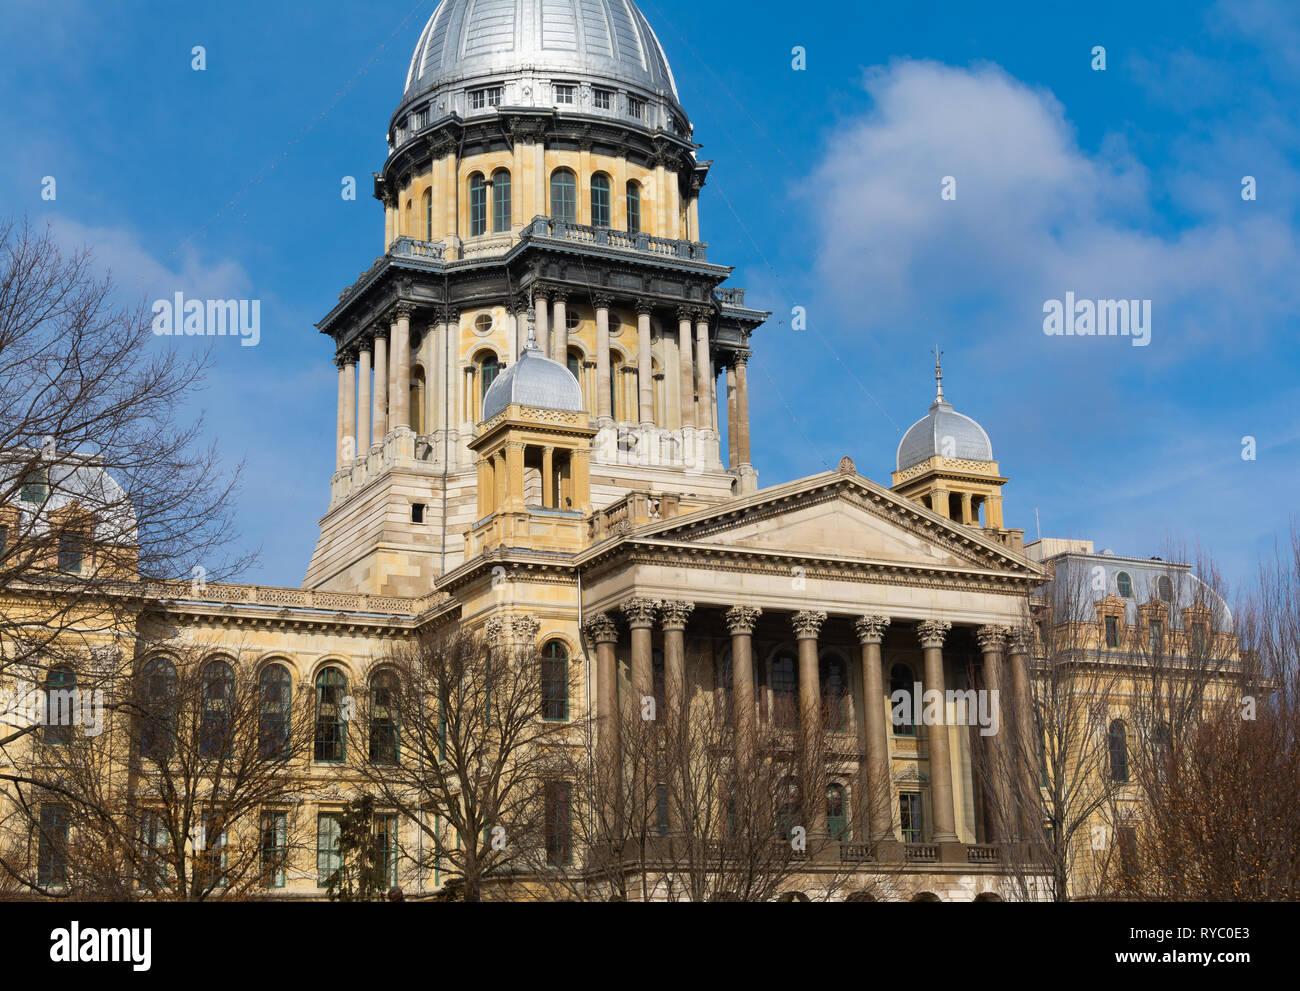 Exterior of the Illinois State Capitol Building.  Springfield, Illinois, USA. Stock Photo